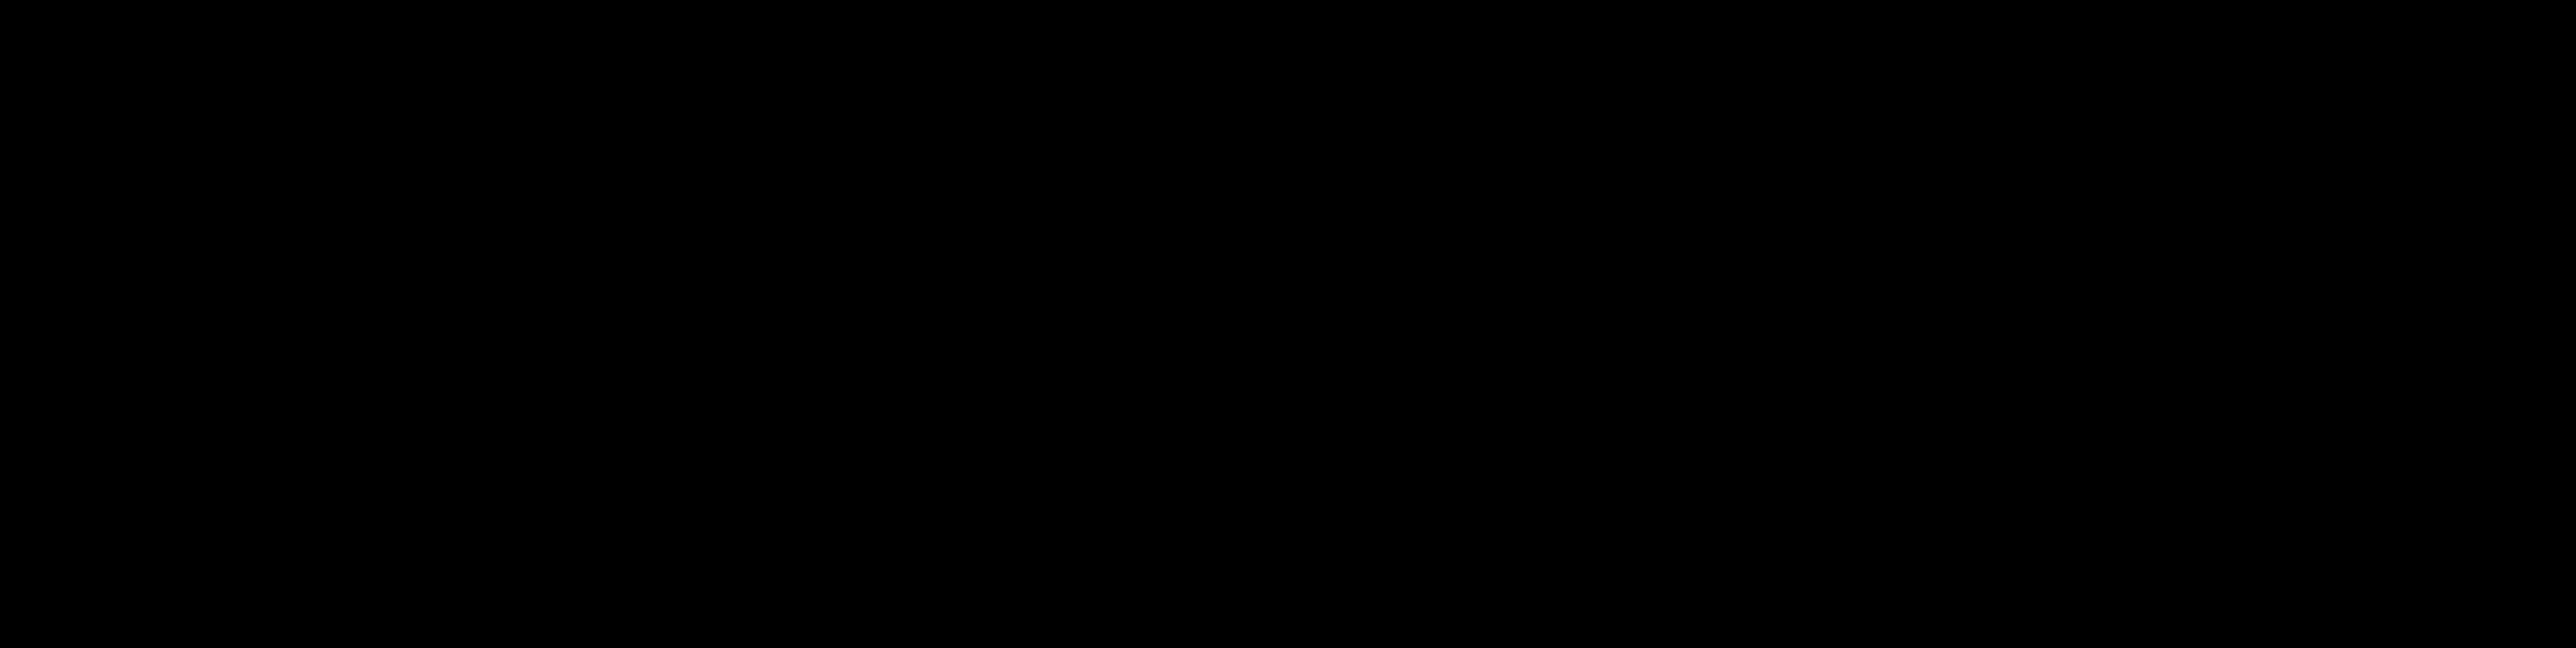 N-Biotinyl-4,7,10-trioxa-1,13-tridecanediamine